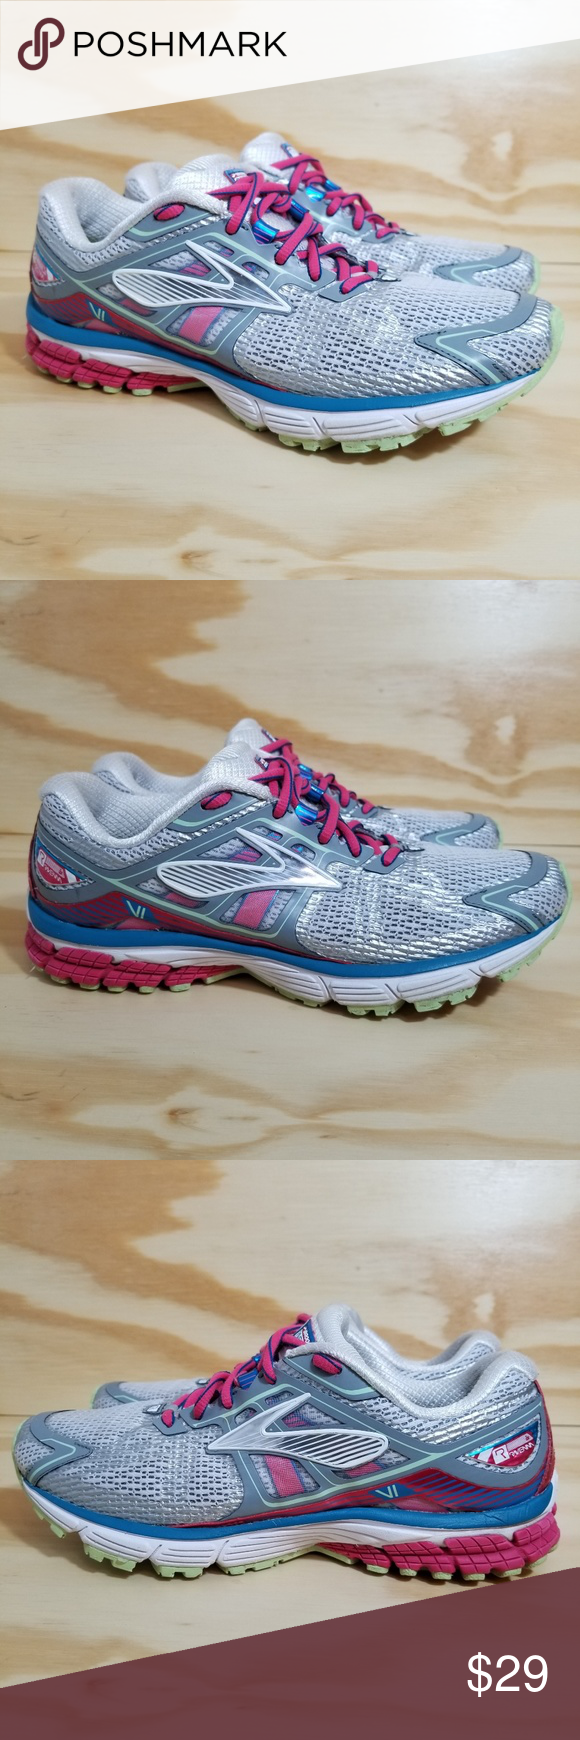 f3a5a7e3e2b Women s Brooks Ravenna Running Shoes Women s Brooks Ravenna Running Shoes  Size 9 White Pink Mesh Laces